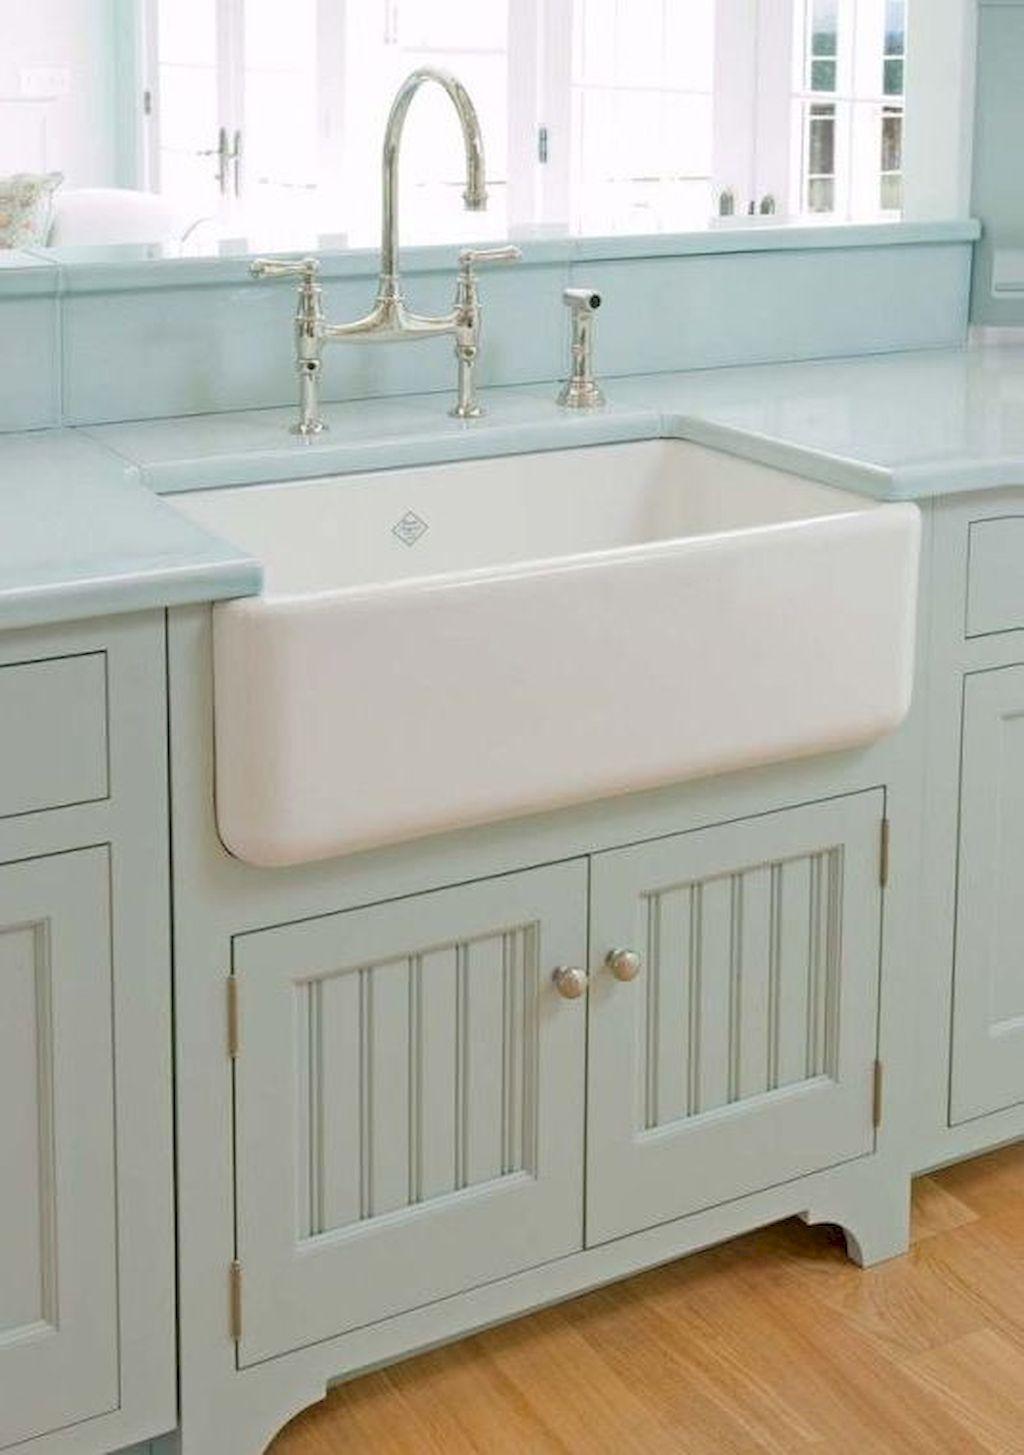 Best rustic kitchen sink farmhouse style ideas Rustic kitchen